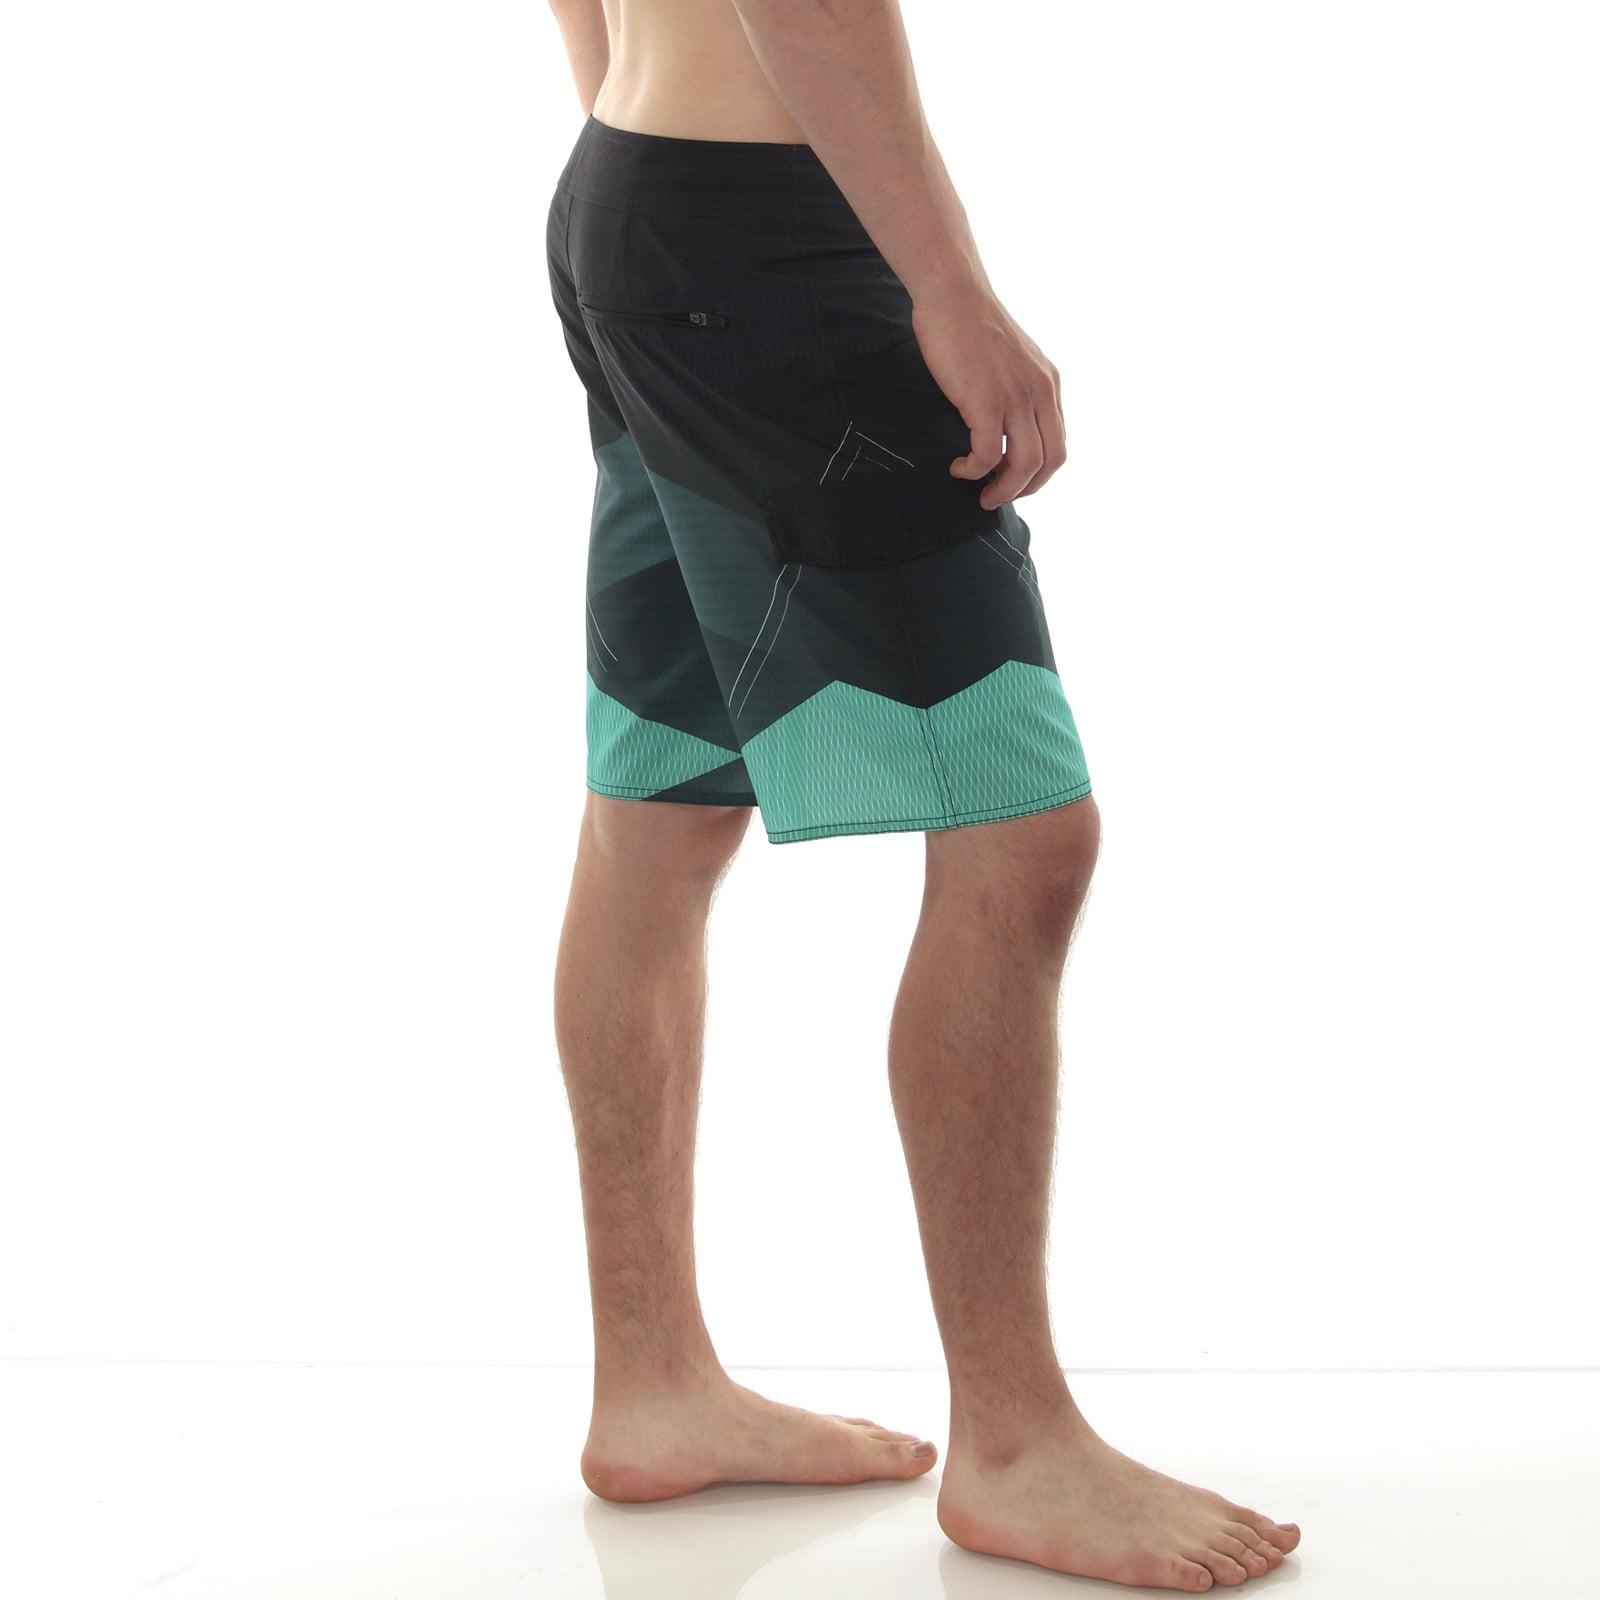 5d5797a28309 alpine swiss - Alpine Swiss Mens Boardshorts Swim Trunks Hybrid Short Side  Pockets Board Short - Walmart.com